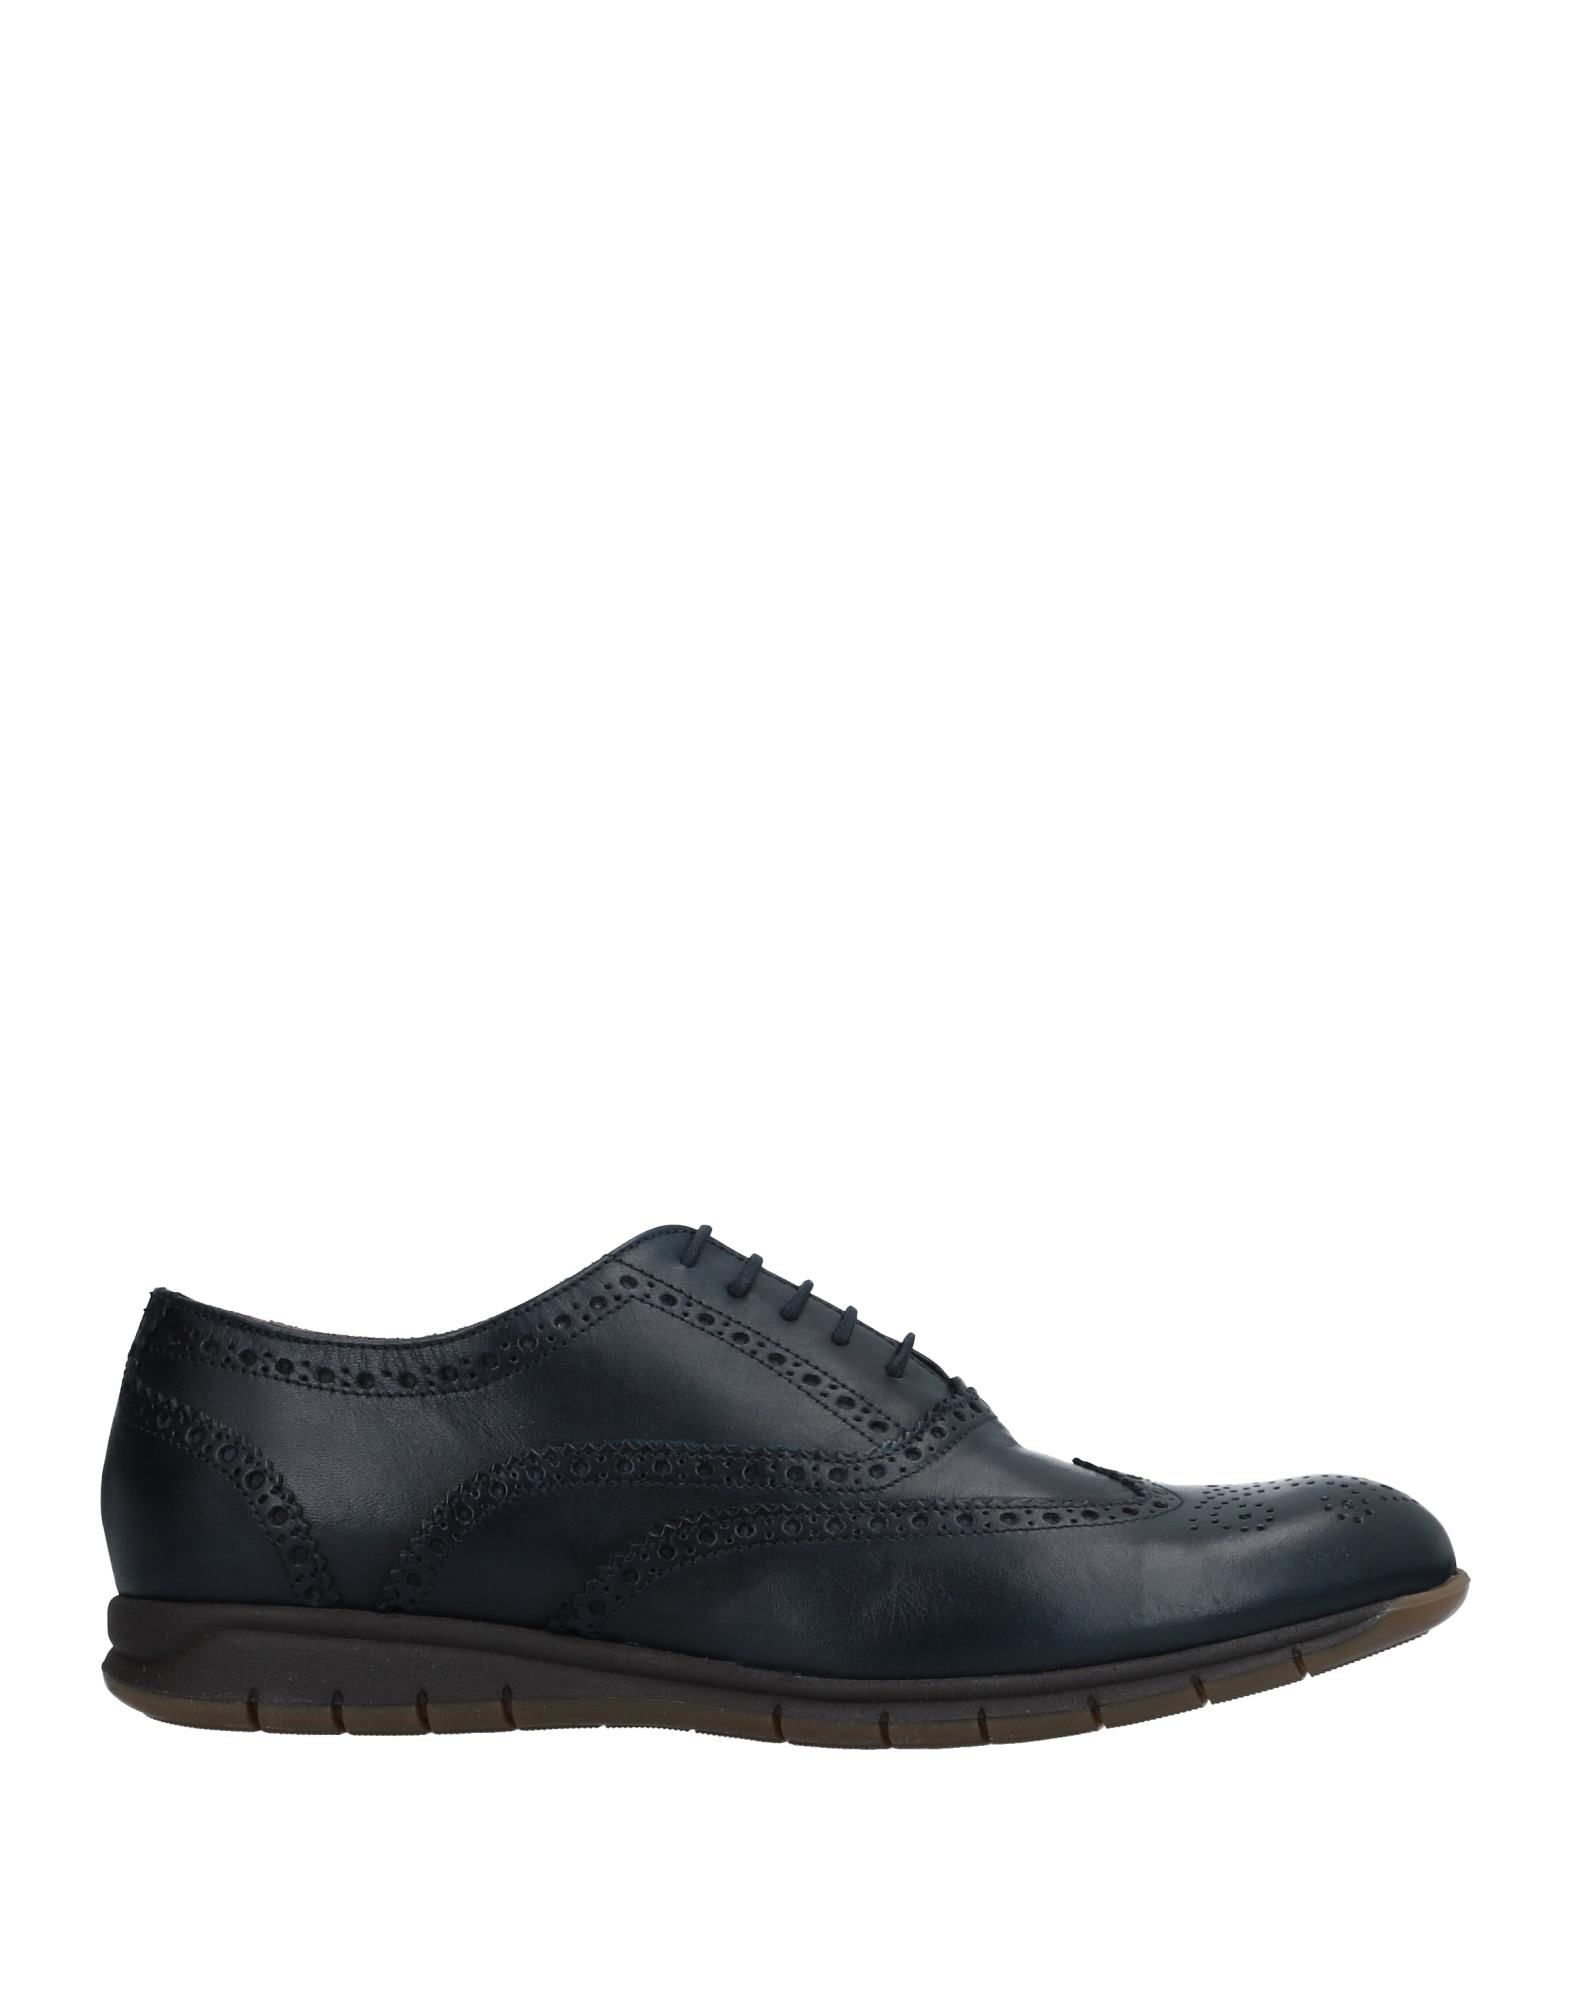 Cantarelli Schnürschuhe Herren  11507780TP Gute Qualität beliebte Schuhe